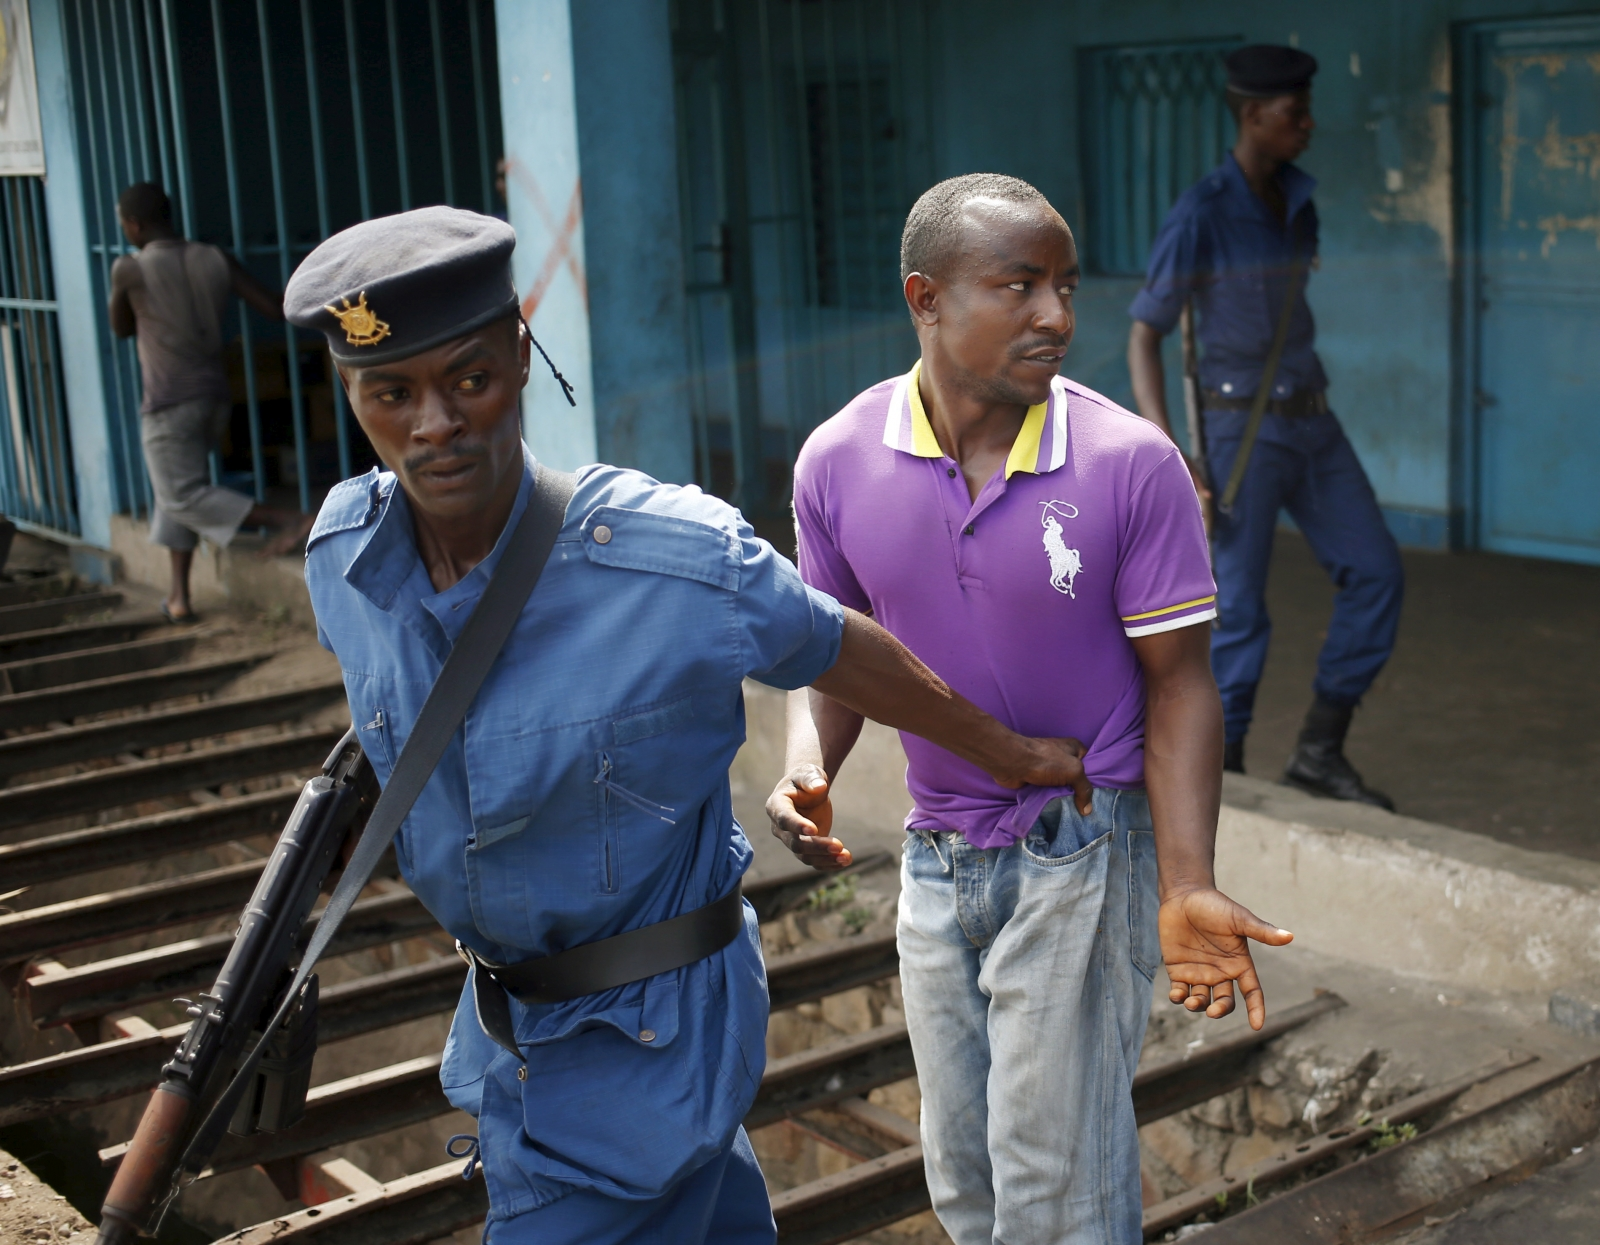 Burundi protesters arrest